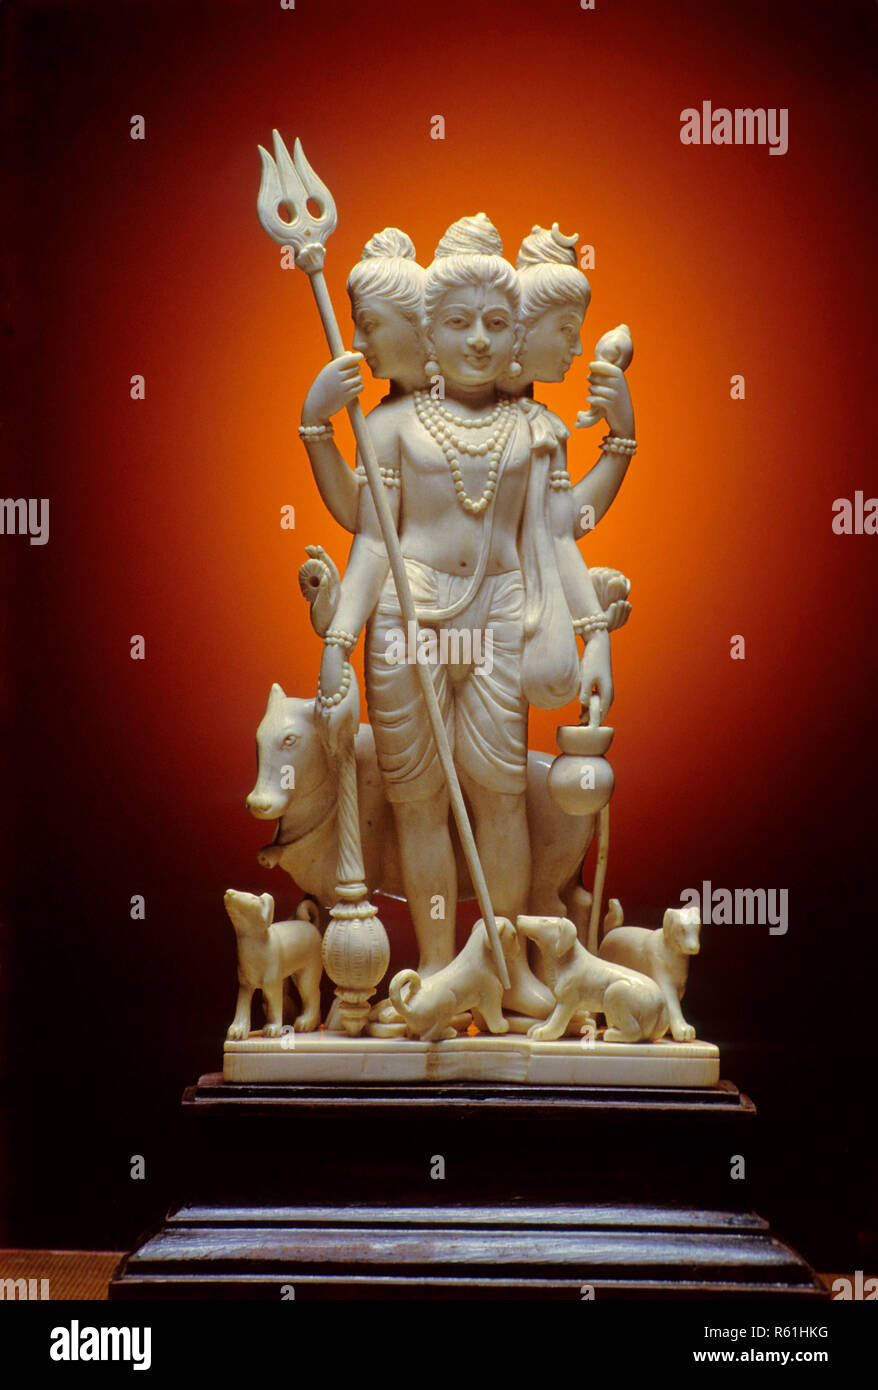 god datta prabhu, festival book page 85 - Stock Image